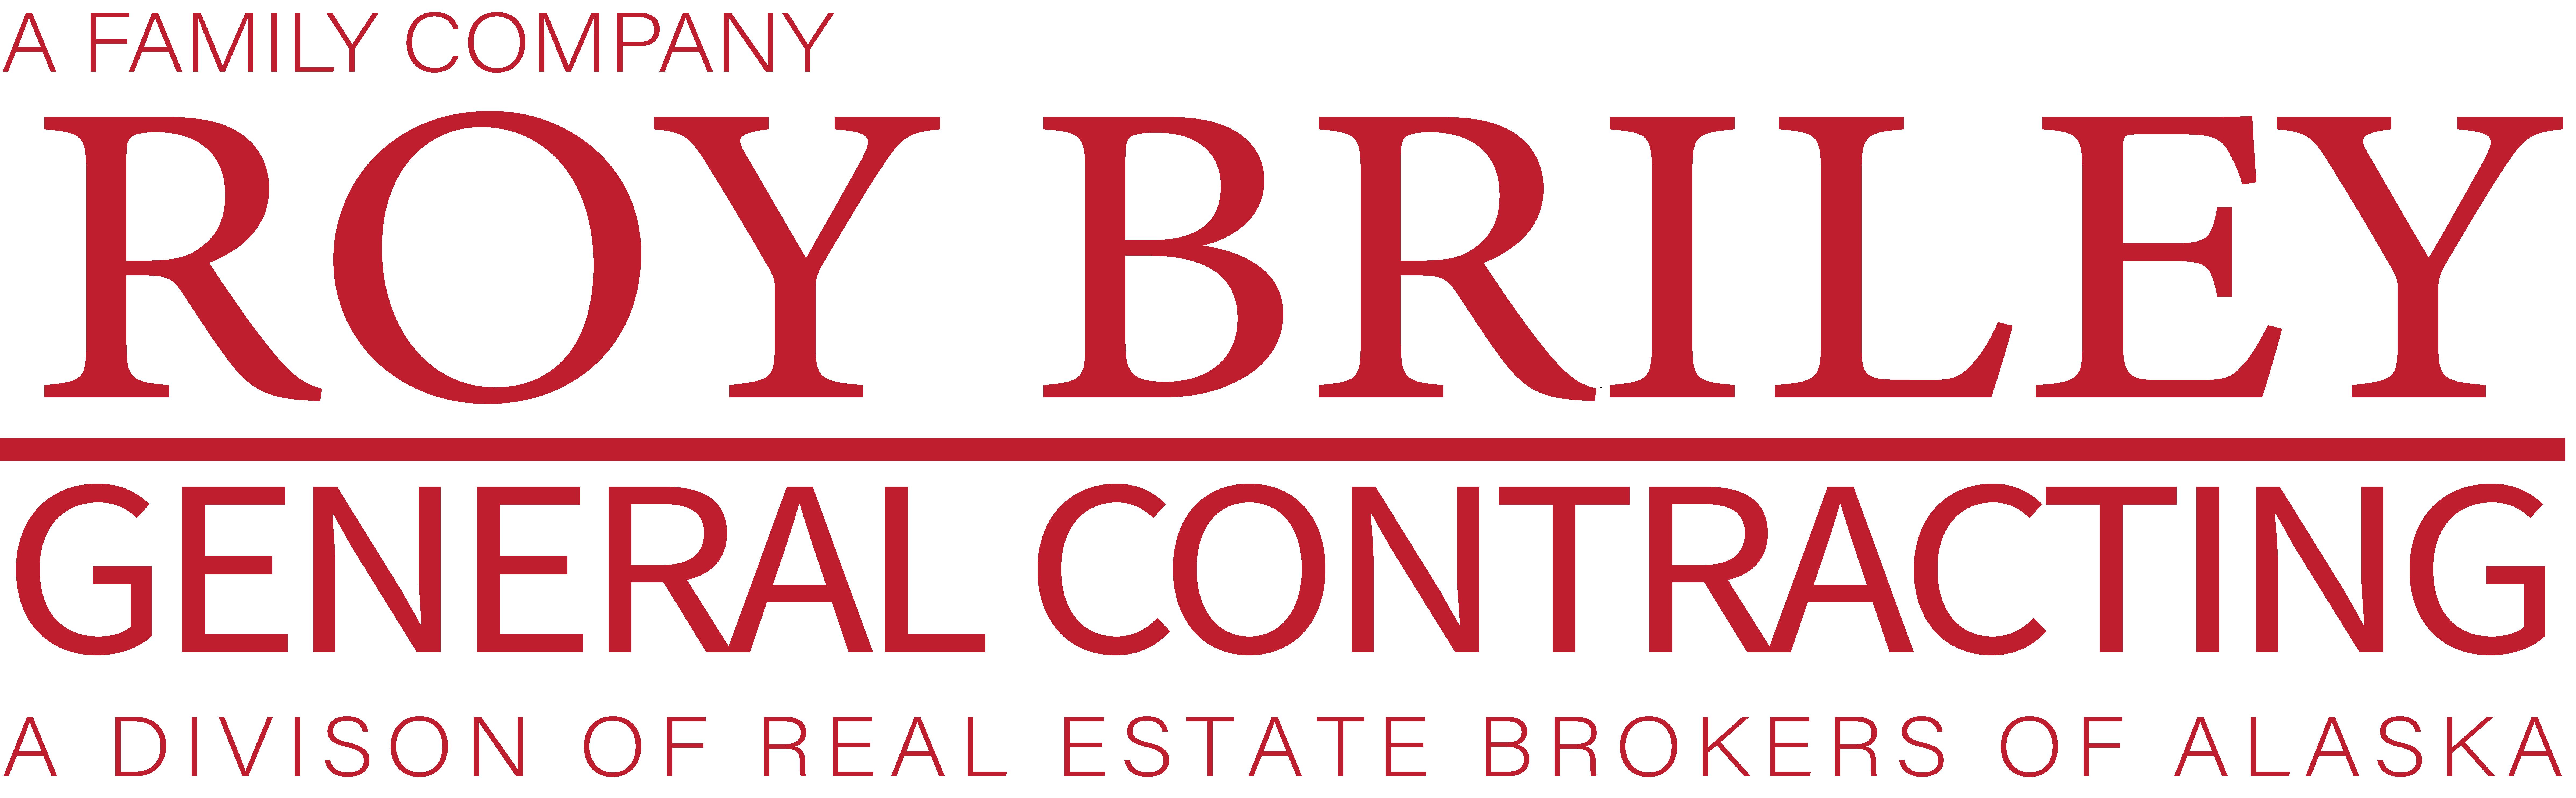 Real Estate Brokers of Alaska | 907-947-6600 | Buy or Sell